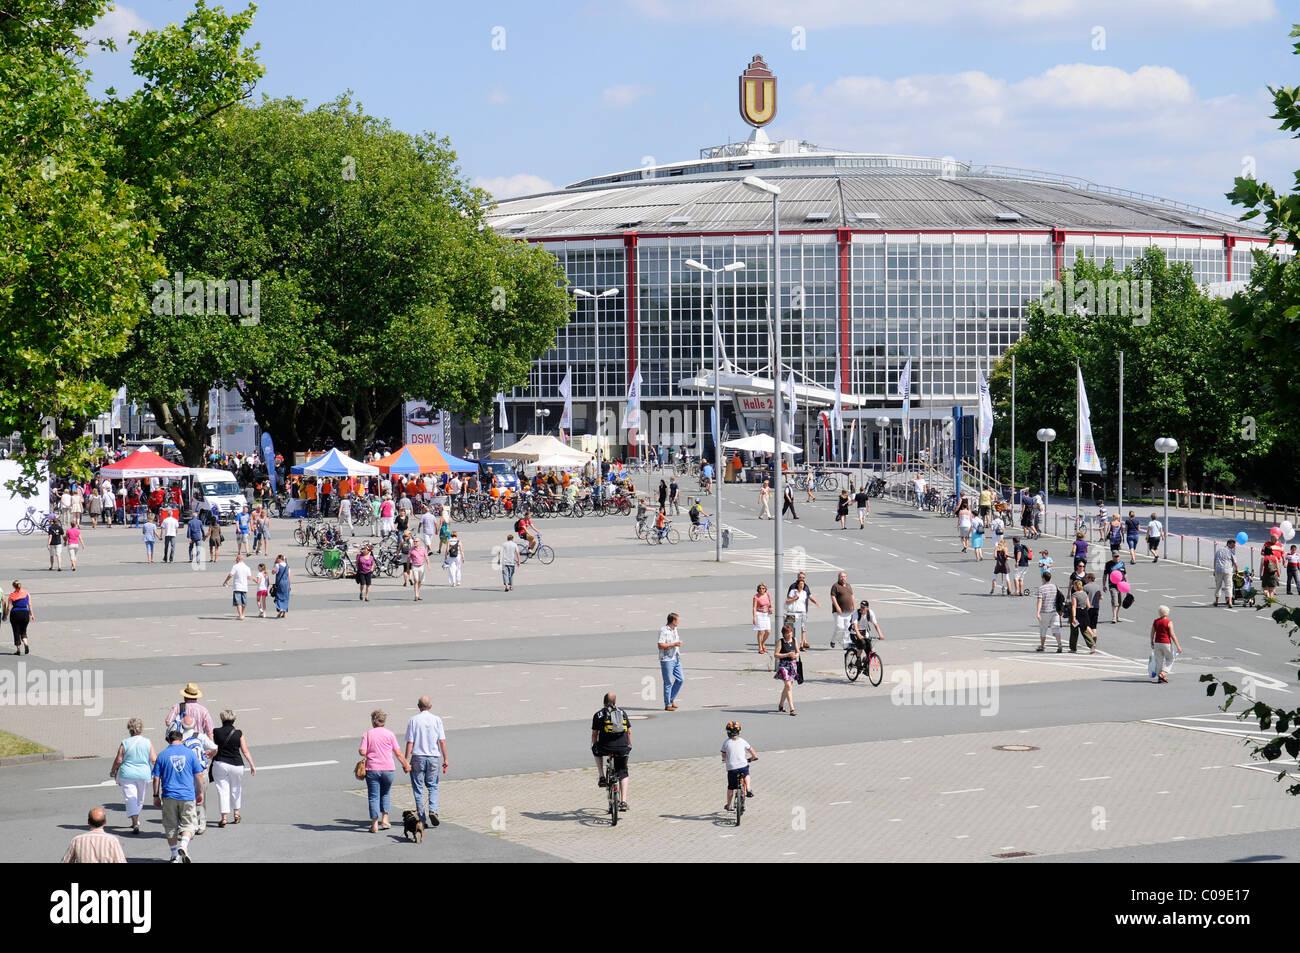 Westfalenhallen Hall, Still-Leben Ruhrschnellweg, B1, A 40 Autobahn, Autobahn gesperrt für Autos, Kunst-event Stockbild